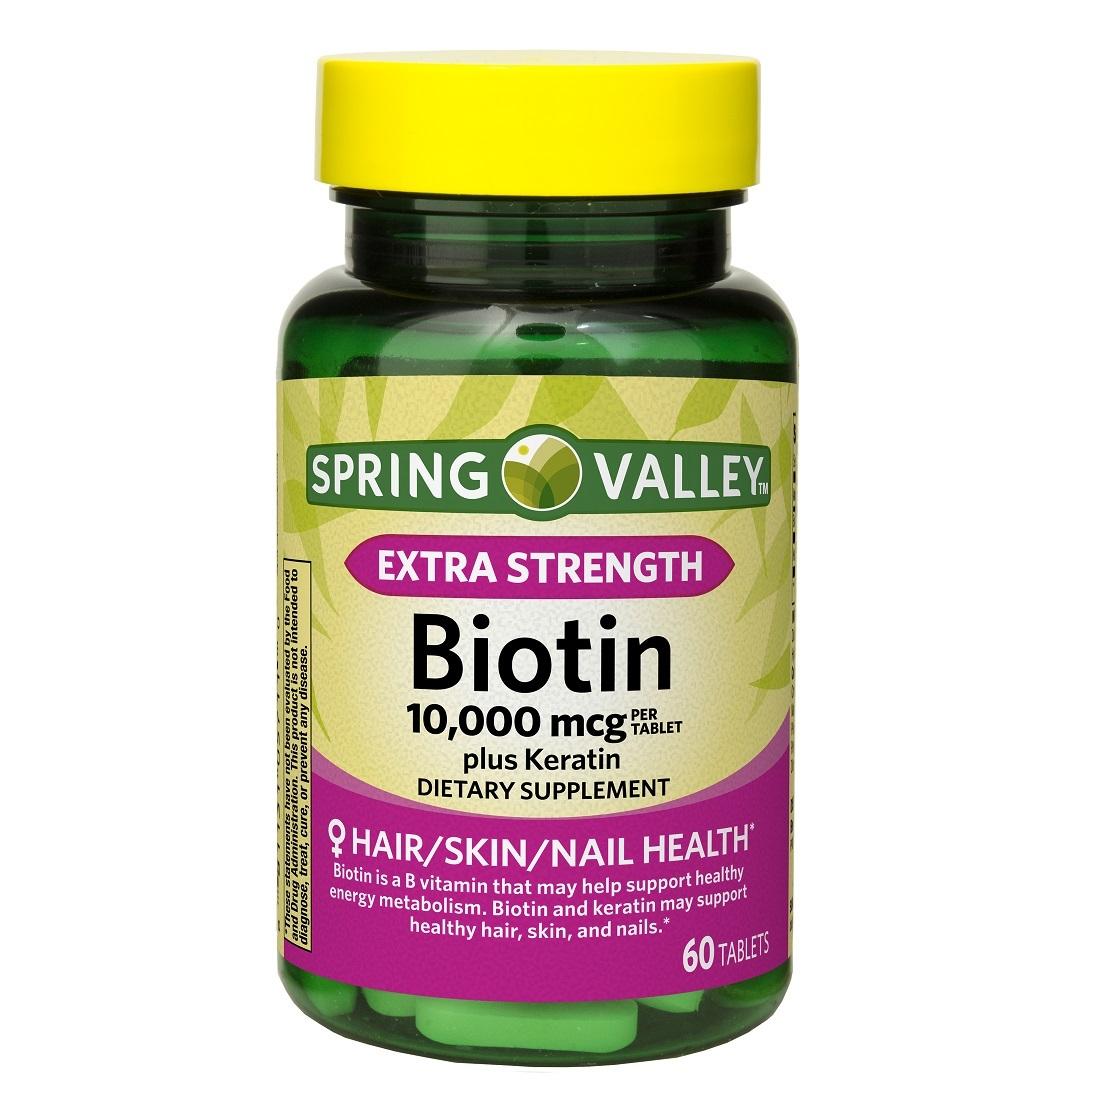 Spring Valley Extra Strength Biotin Plus Keratin Tablets 10000 mcg 60 Count - $15.90